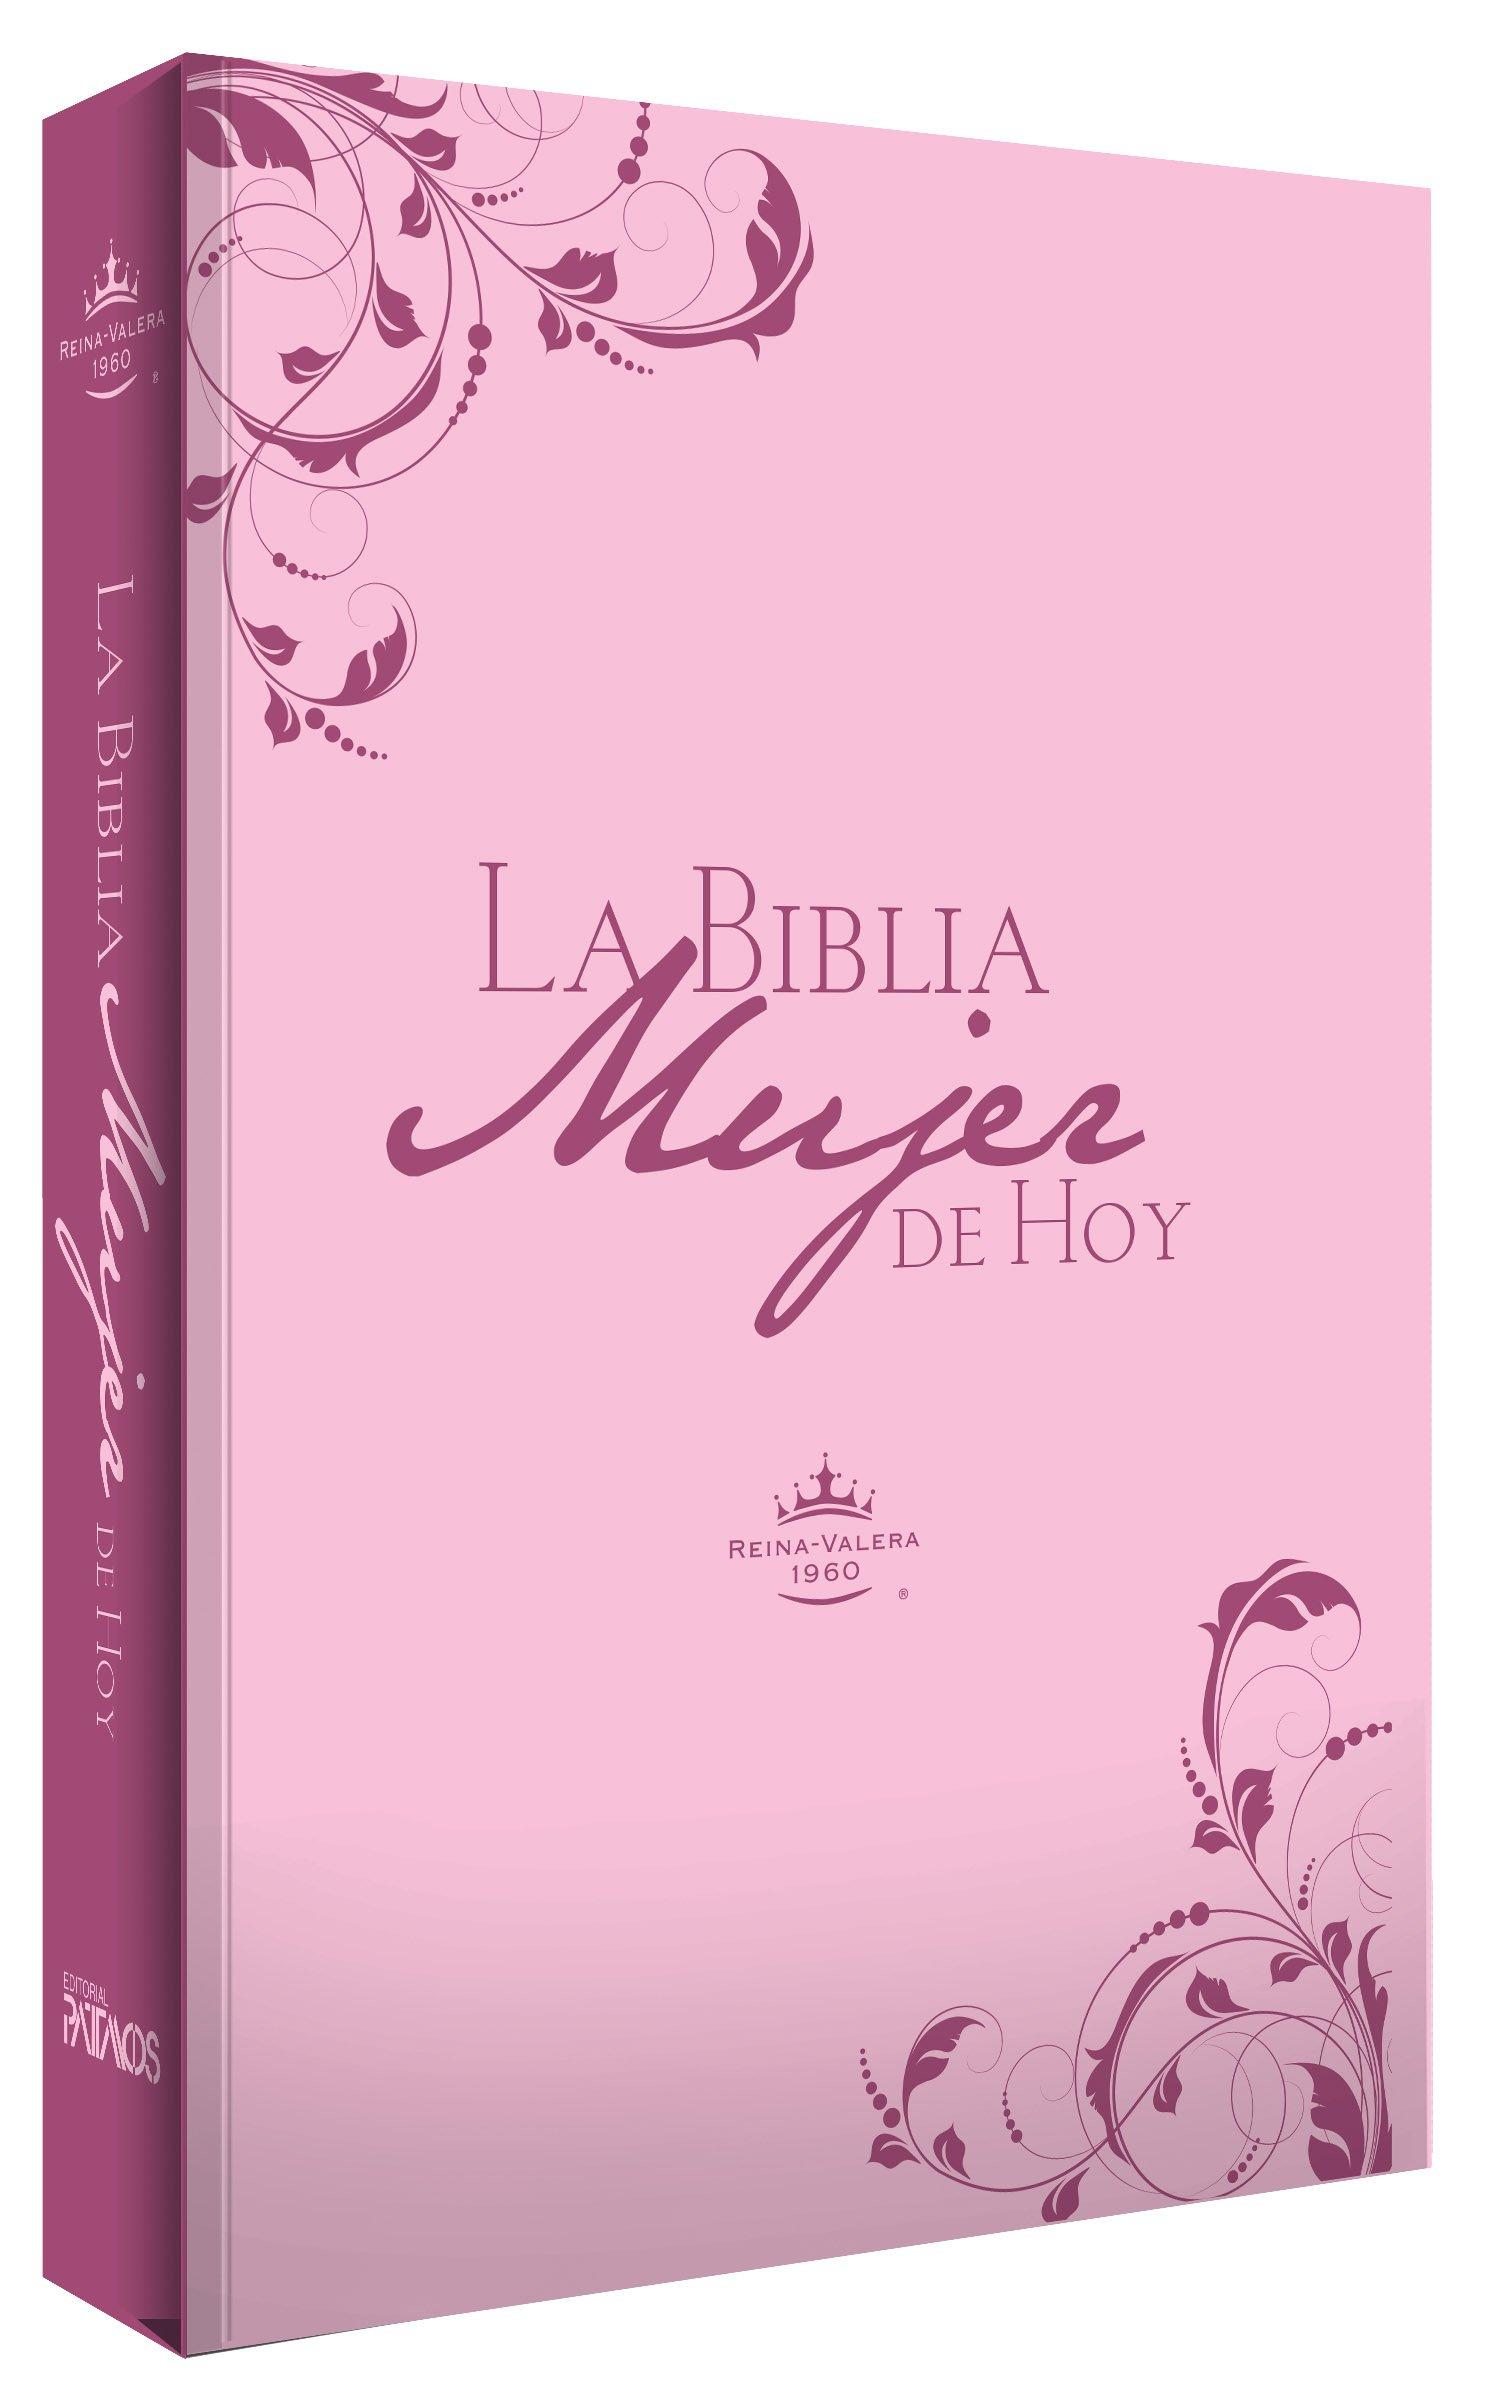 La Biblia Mujer De Hoy - Piel Especial Rosa-reina-valera 1960: PATMOS: 9781588027016: Amazon.com: Books